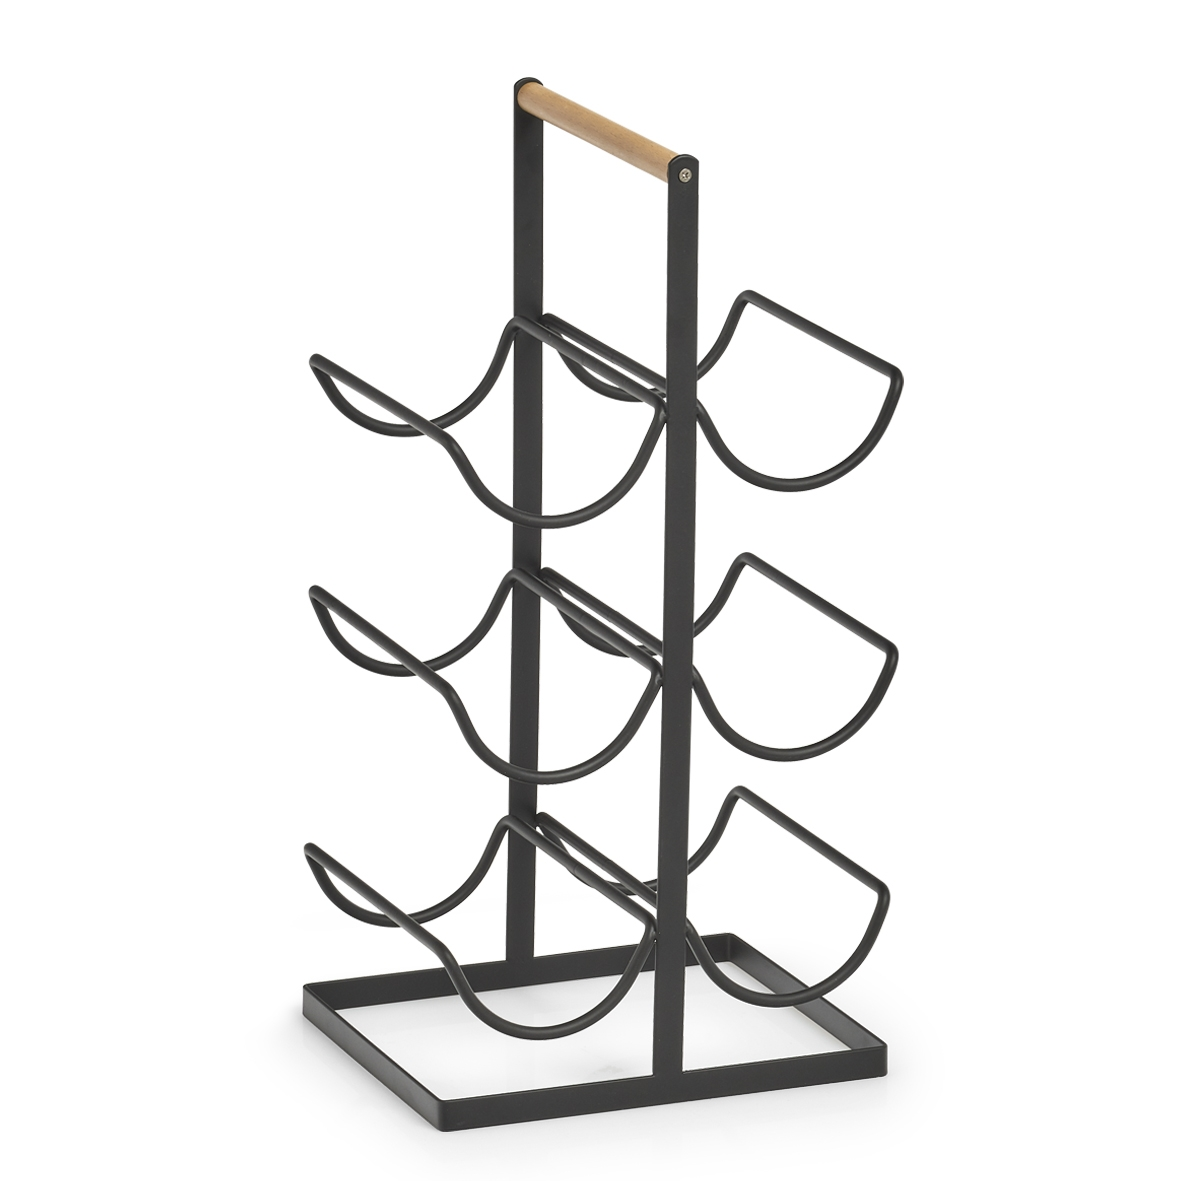 Suport metalic pentru 6 sticle Rack Negru, l23,5xA20xH46 cm imagine